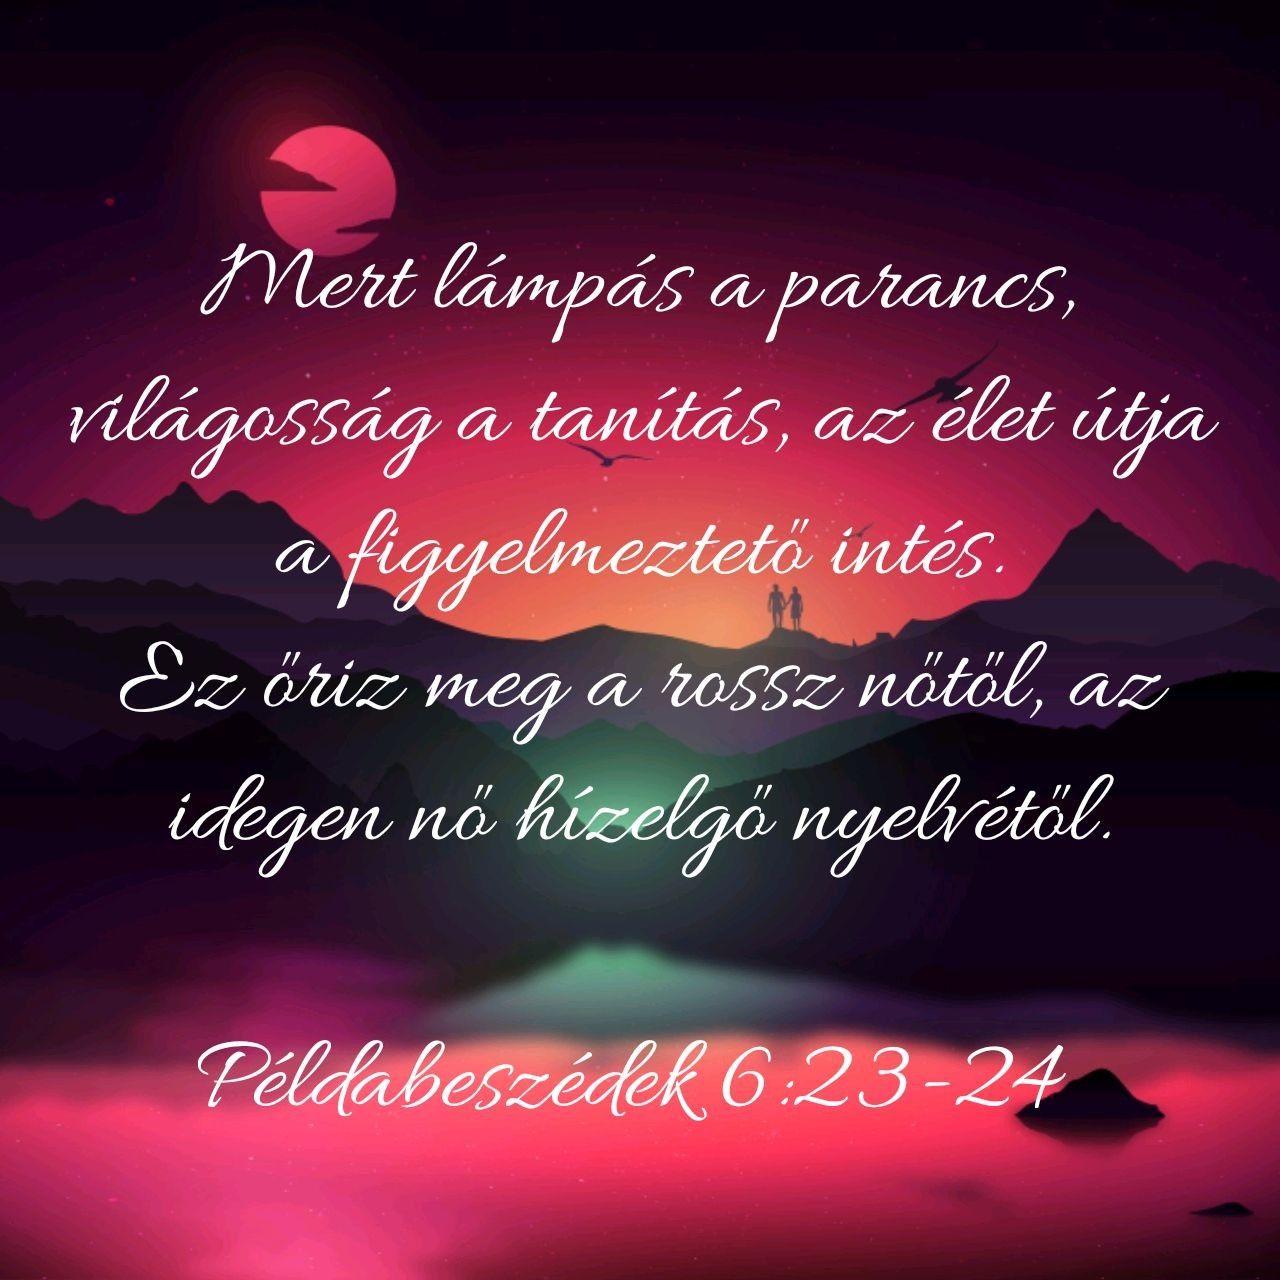 hűtlenség idézetek Isten #Biblia #ige #hűtlenség (With images)   Biblia, Bibliai